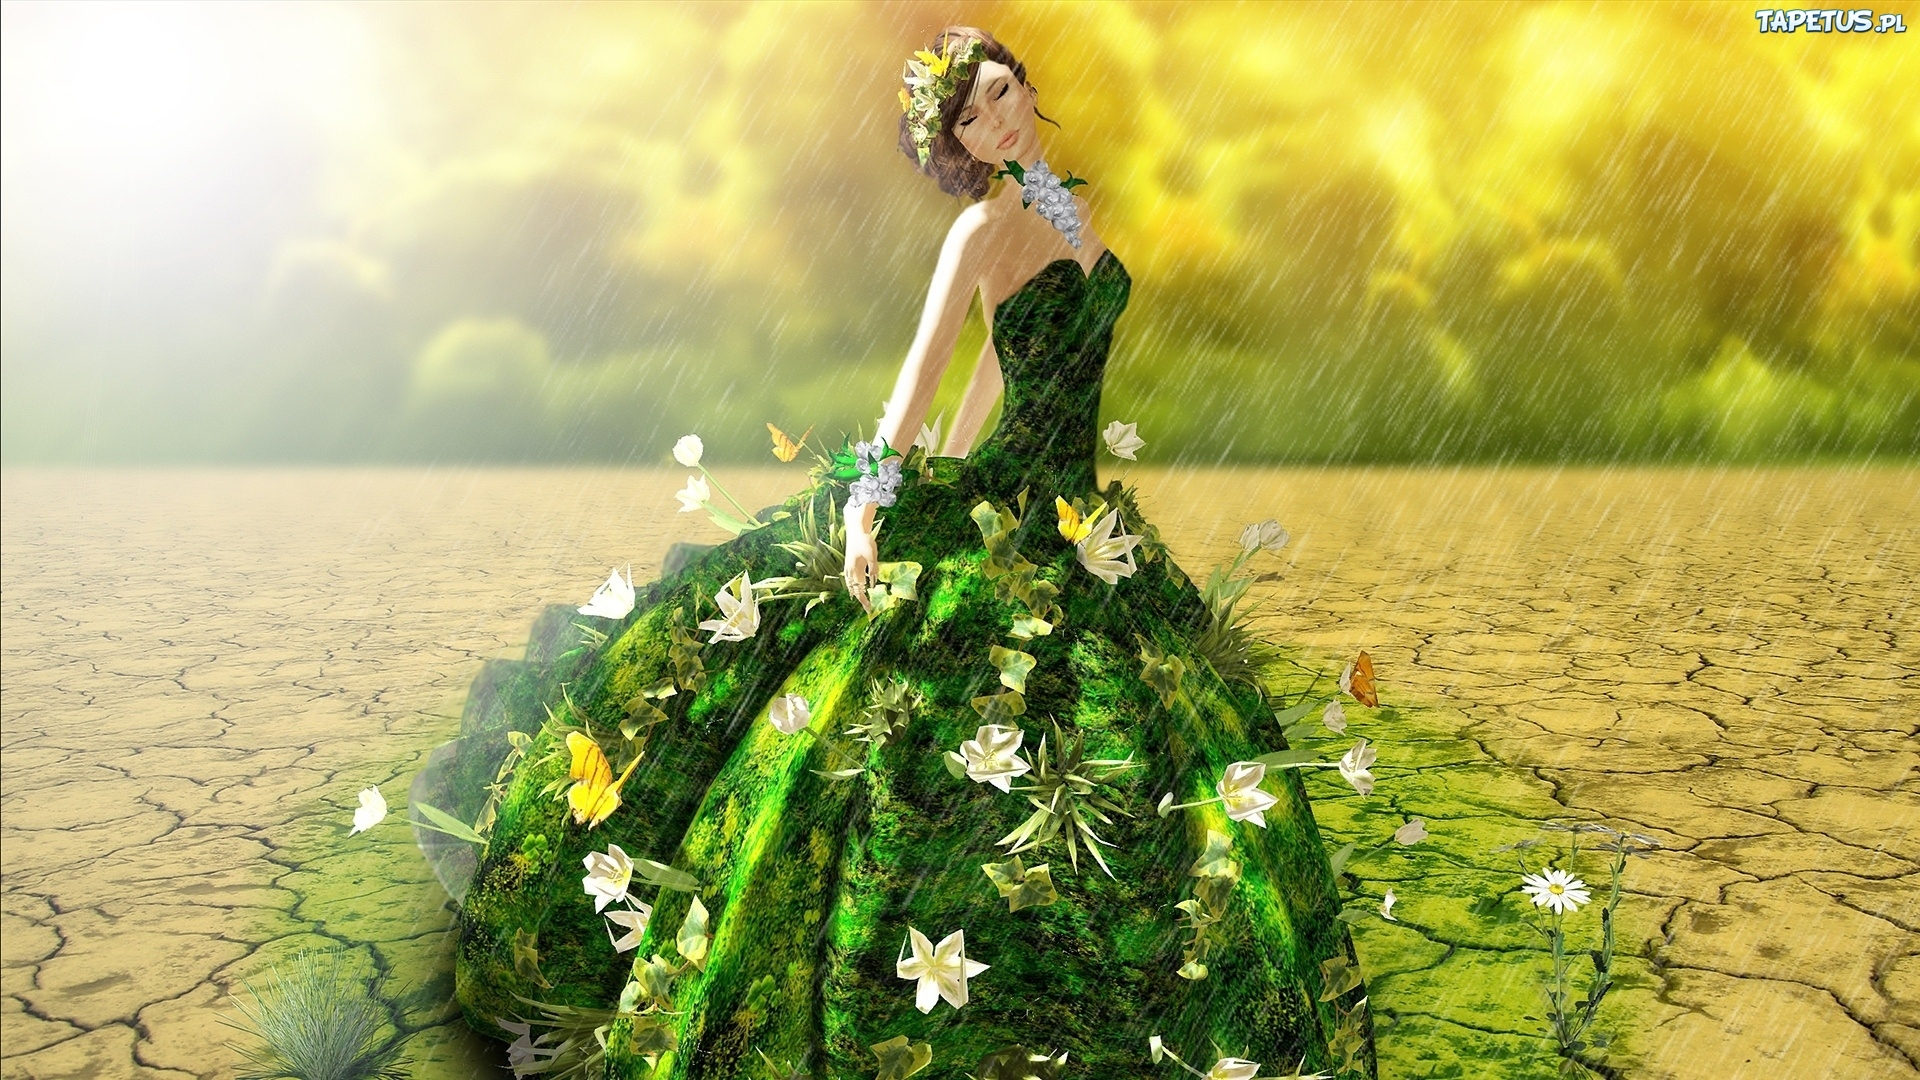 девушка зеленое платье велосипед цветы girl green dress bike flowers онлайн